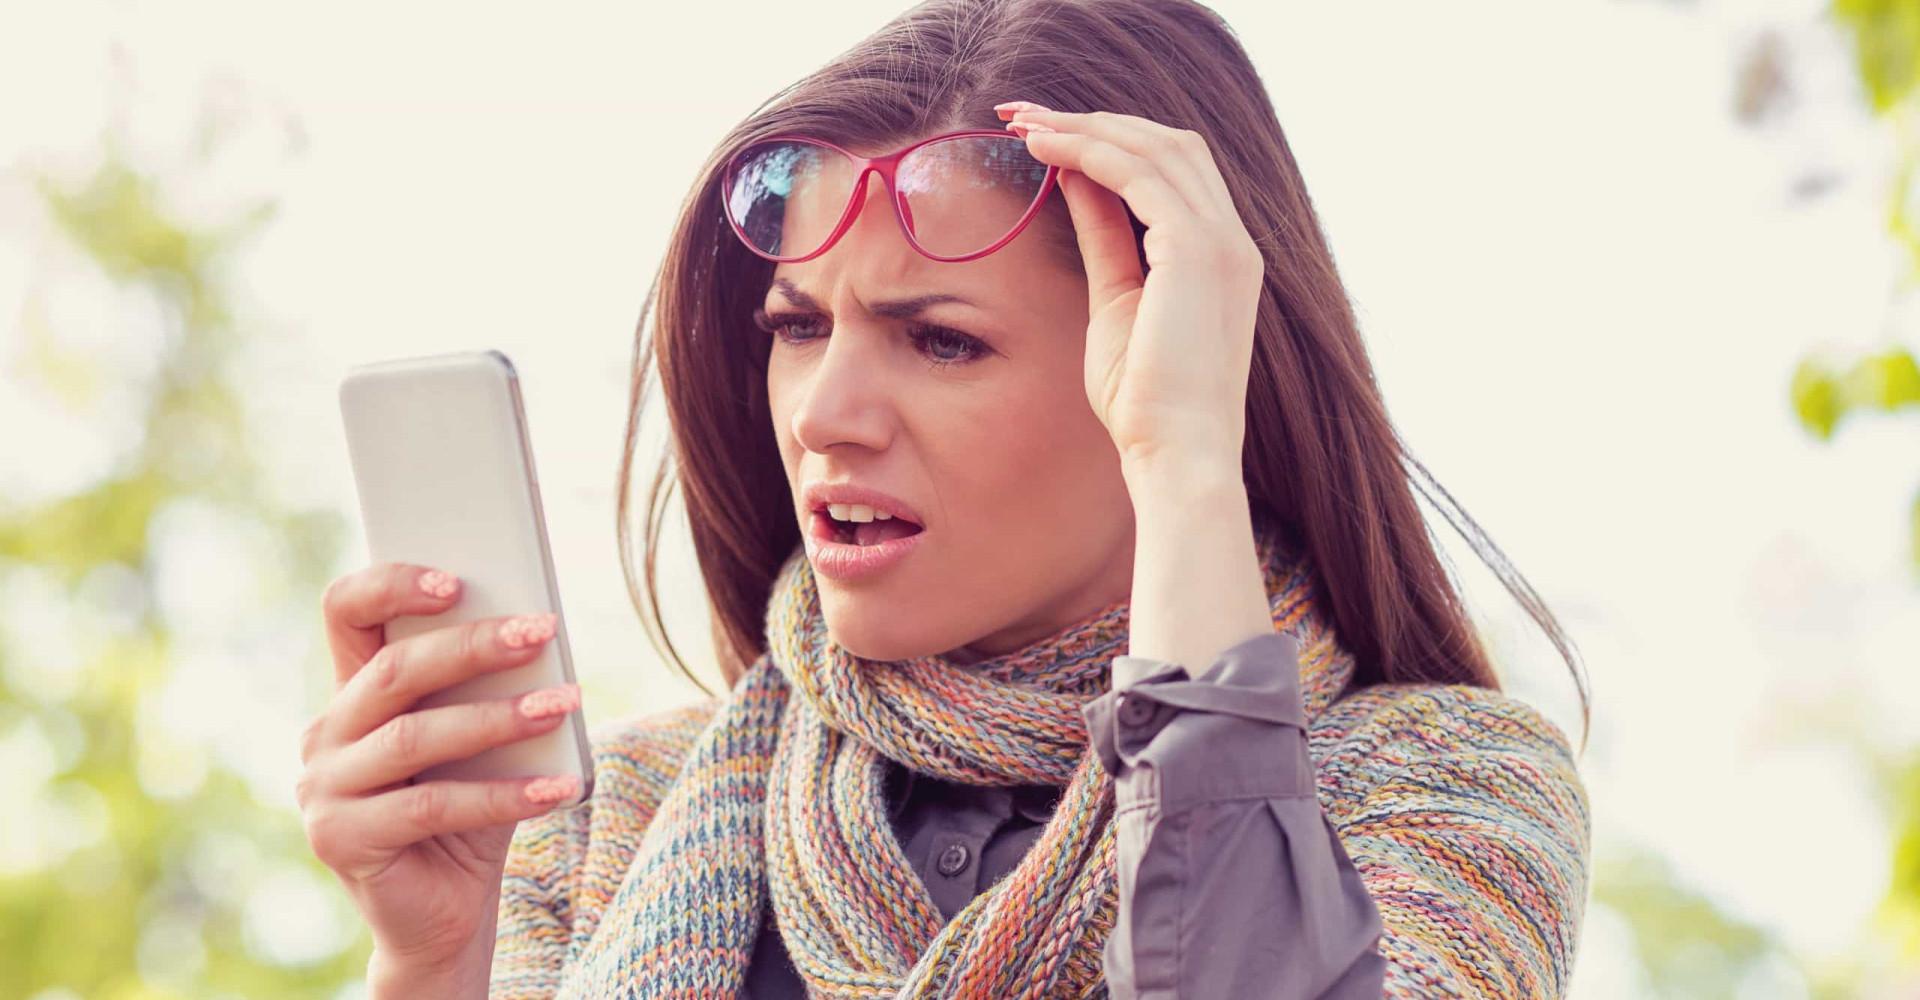 Soziale Medien können Freundschaften zerstören